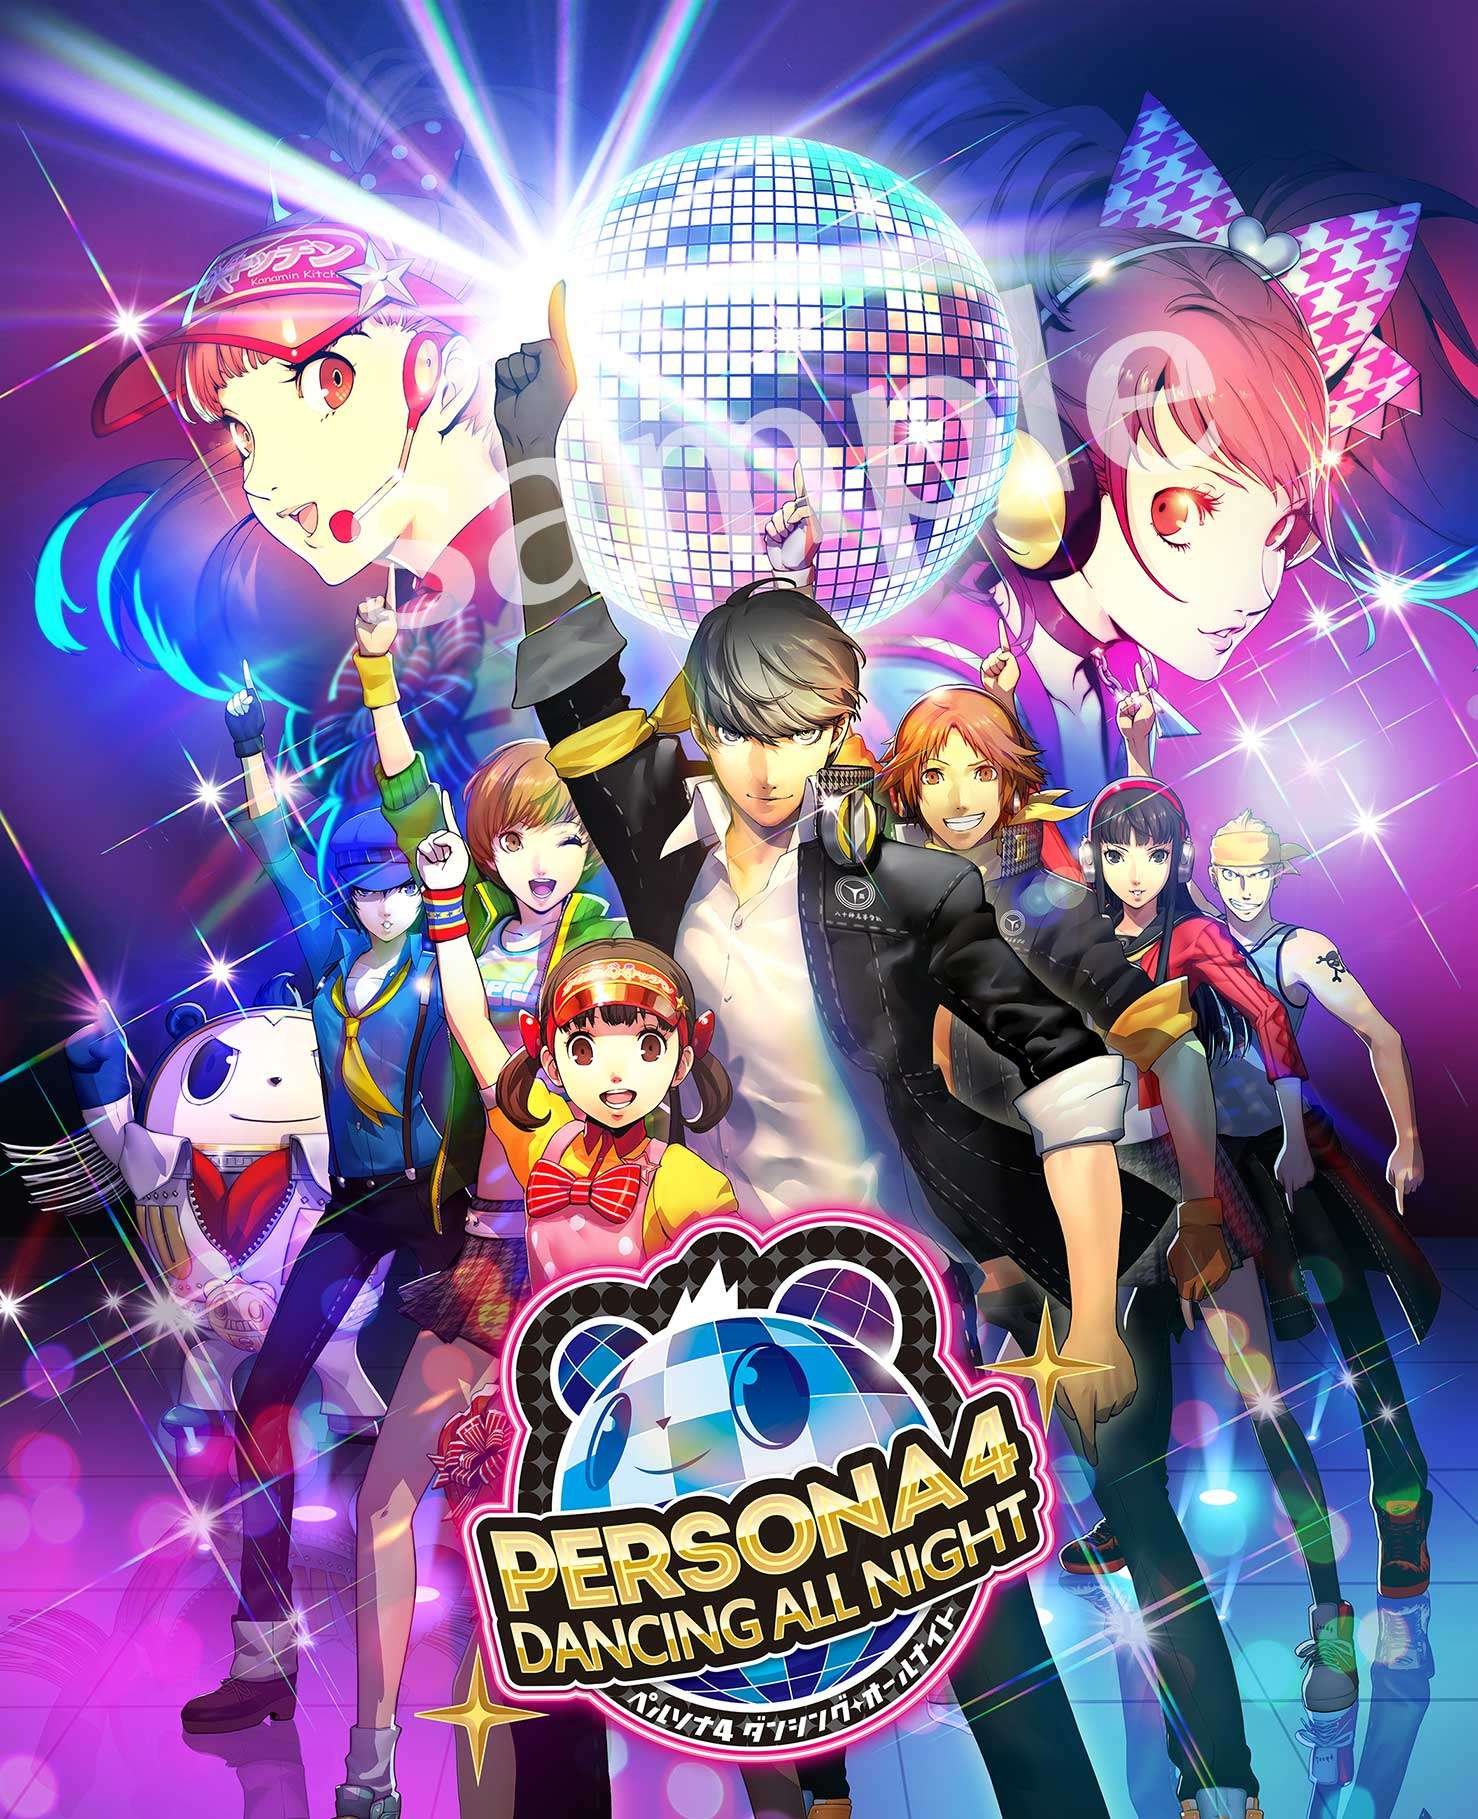 Persona 4 Dancing All Night - Box Art